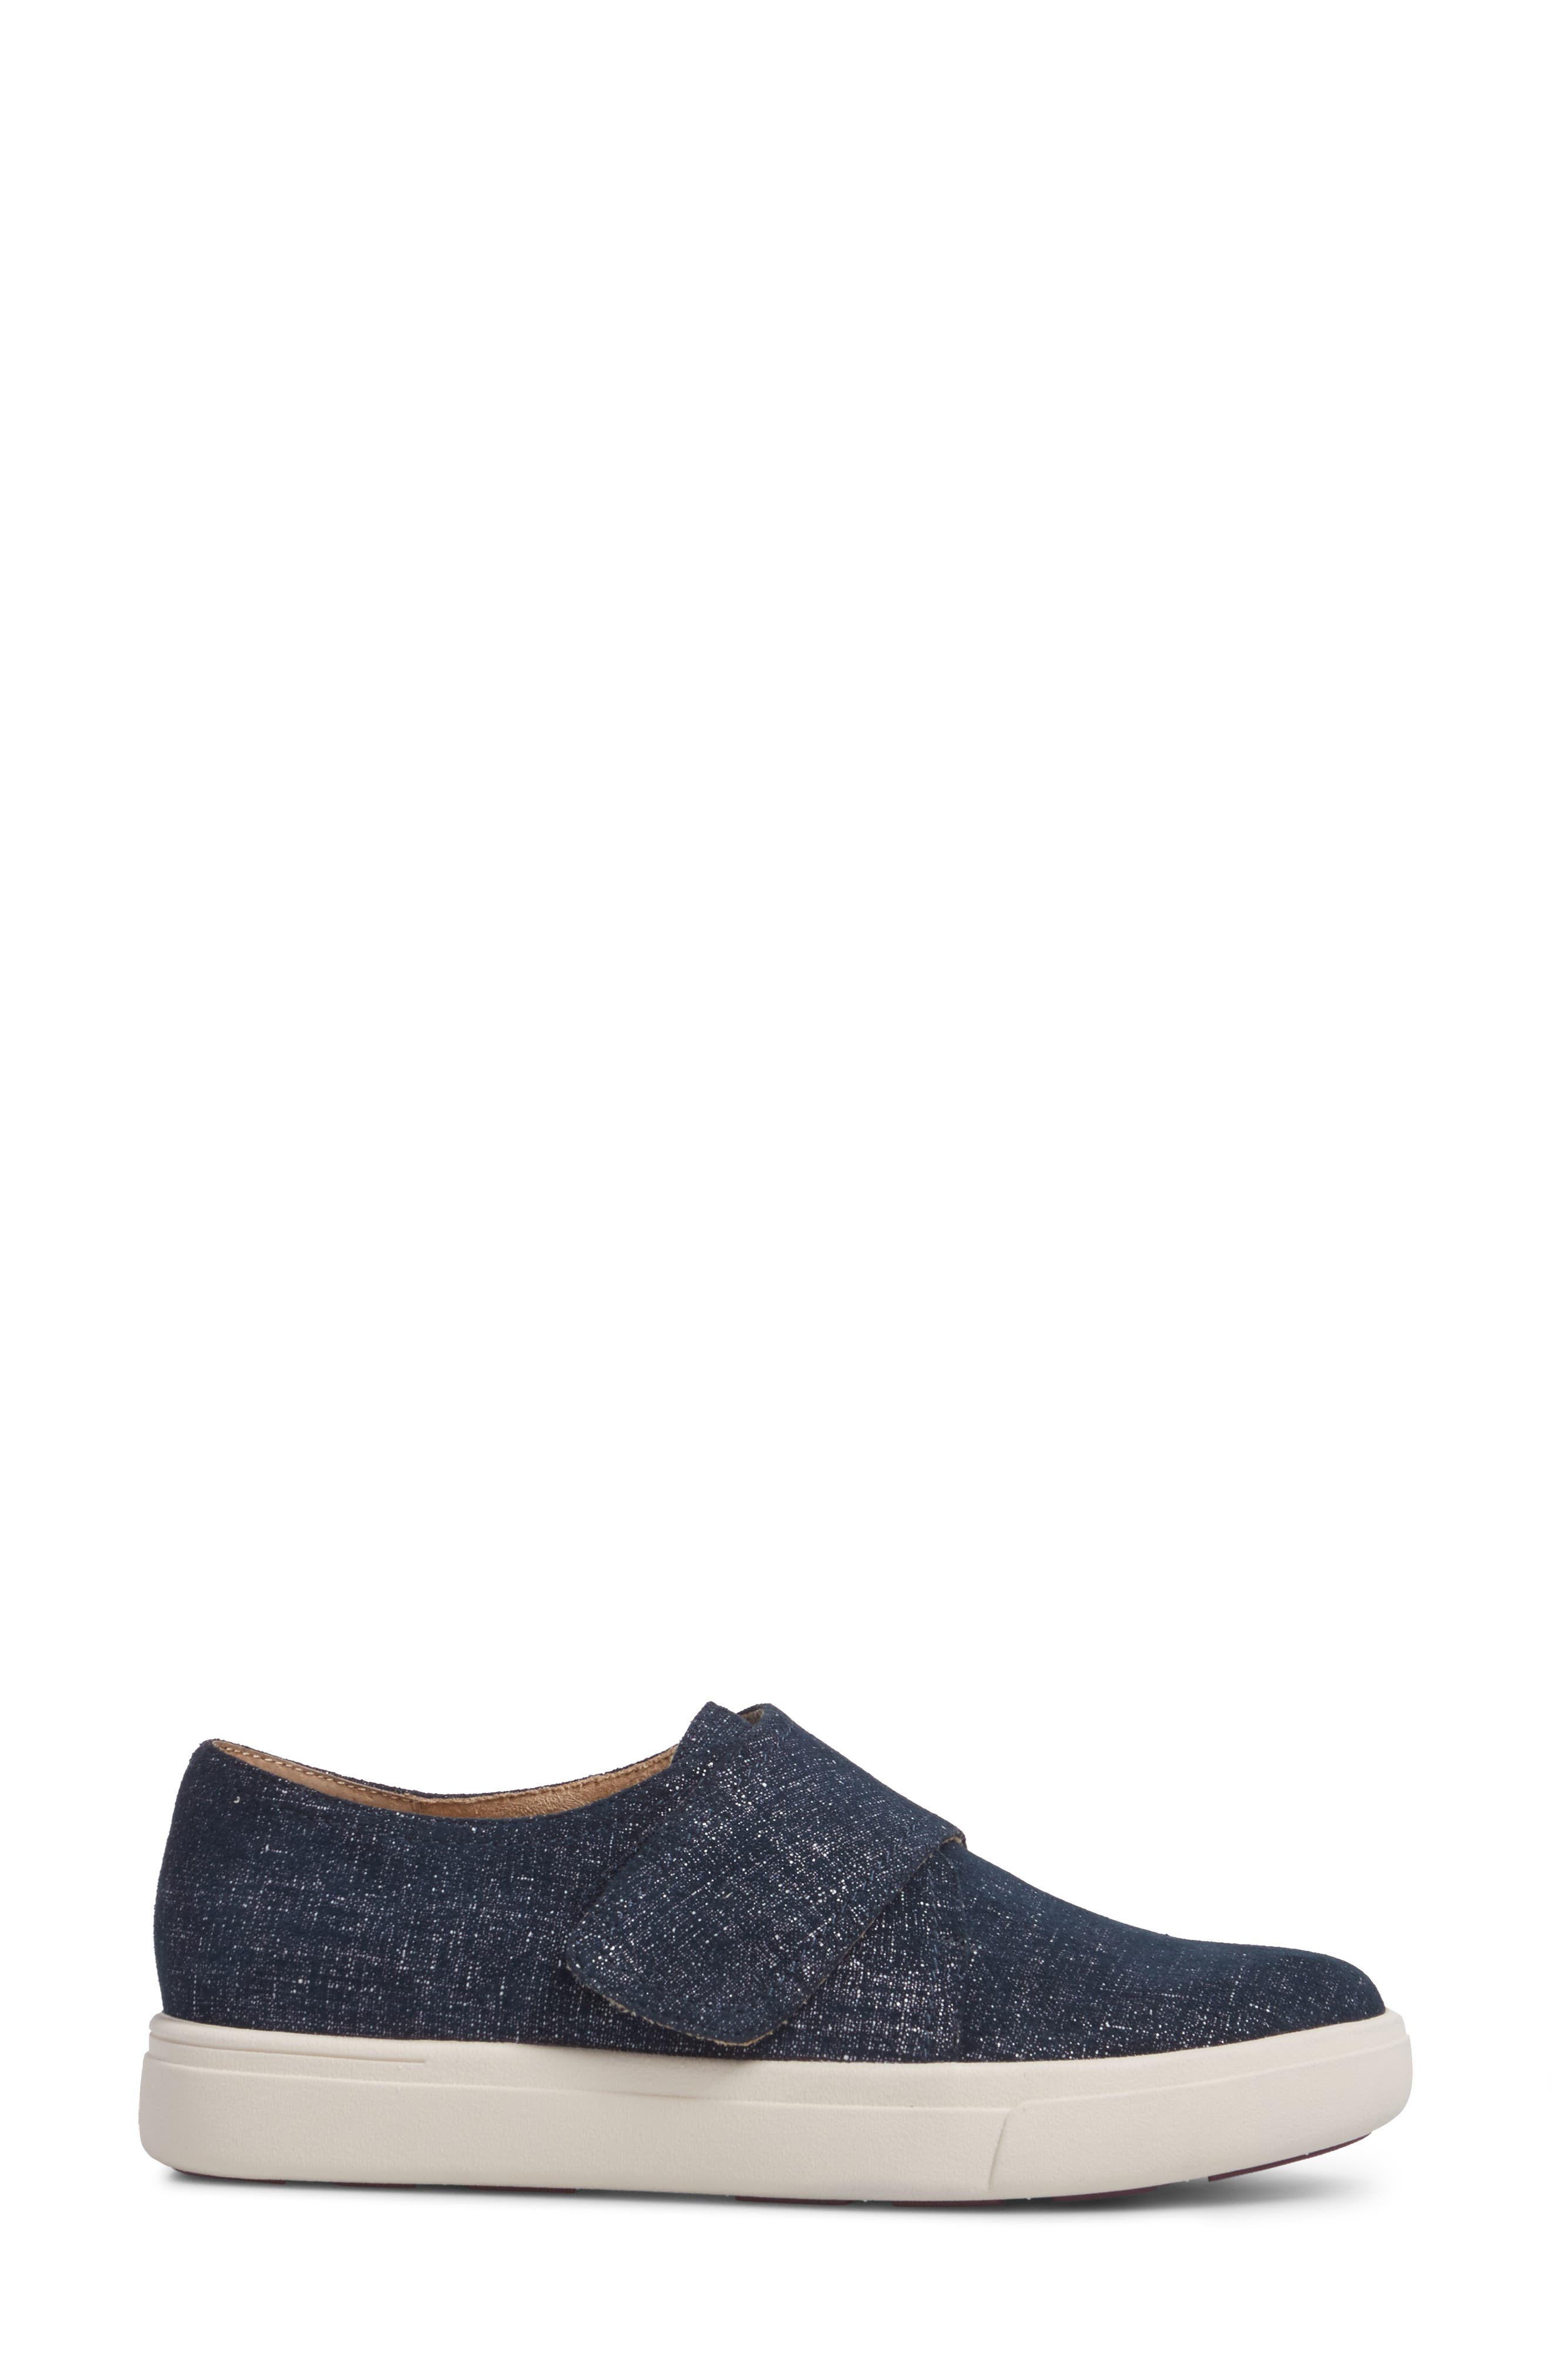 VANELI,                             Oberon Slip-On Sneaker,                             Alternate thumbnail 3, color,                             JEANS PRINTED SUEDE